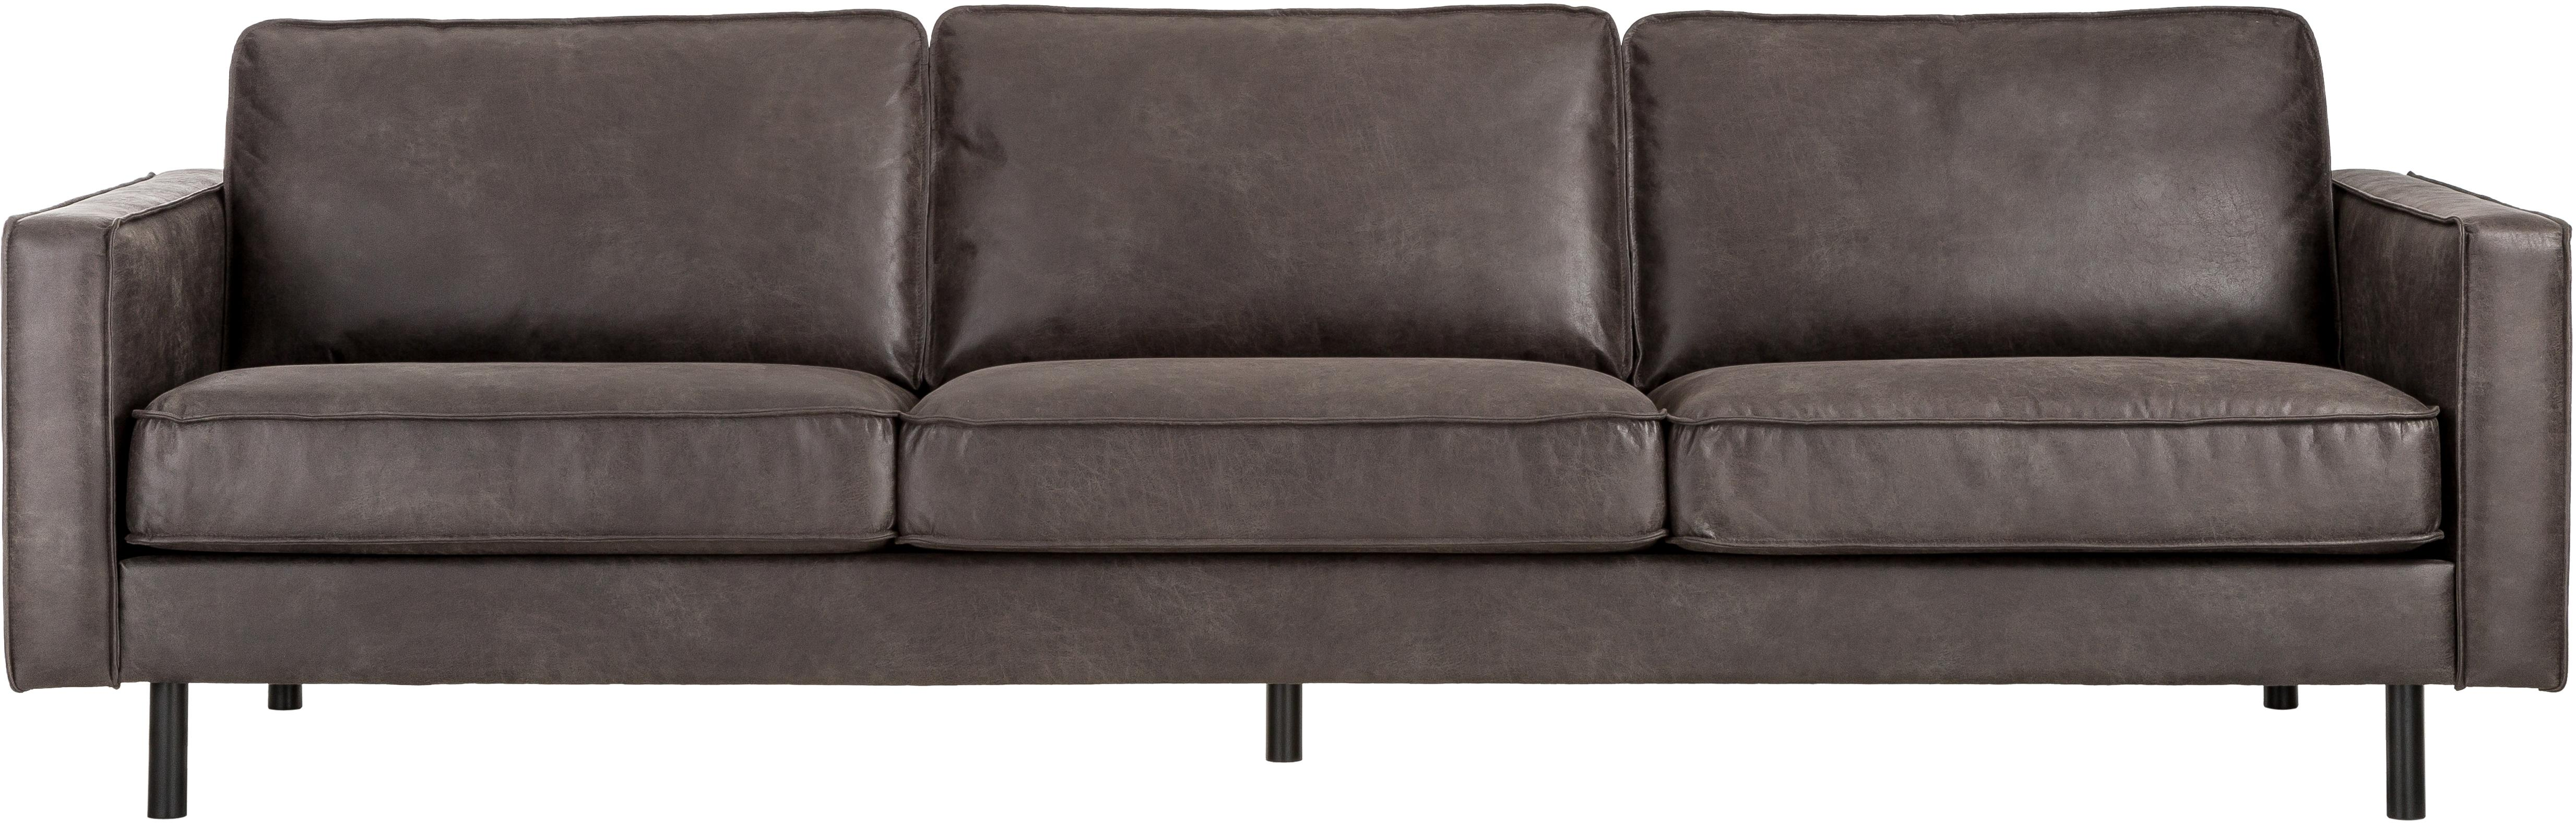 Leder-Sofa Hunter (4-Sitzer), Bezug: 70% recyceltes Leder, 30%, Gestell: Massives Birkenholz und h, Füße: Metall, pulverbeschichtet, Leder Braungrau, B 264 x T 90 cm